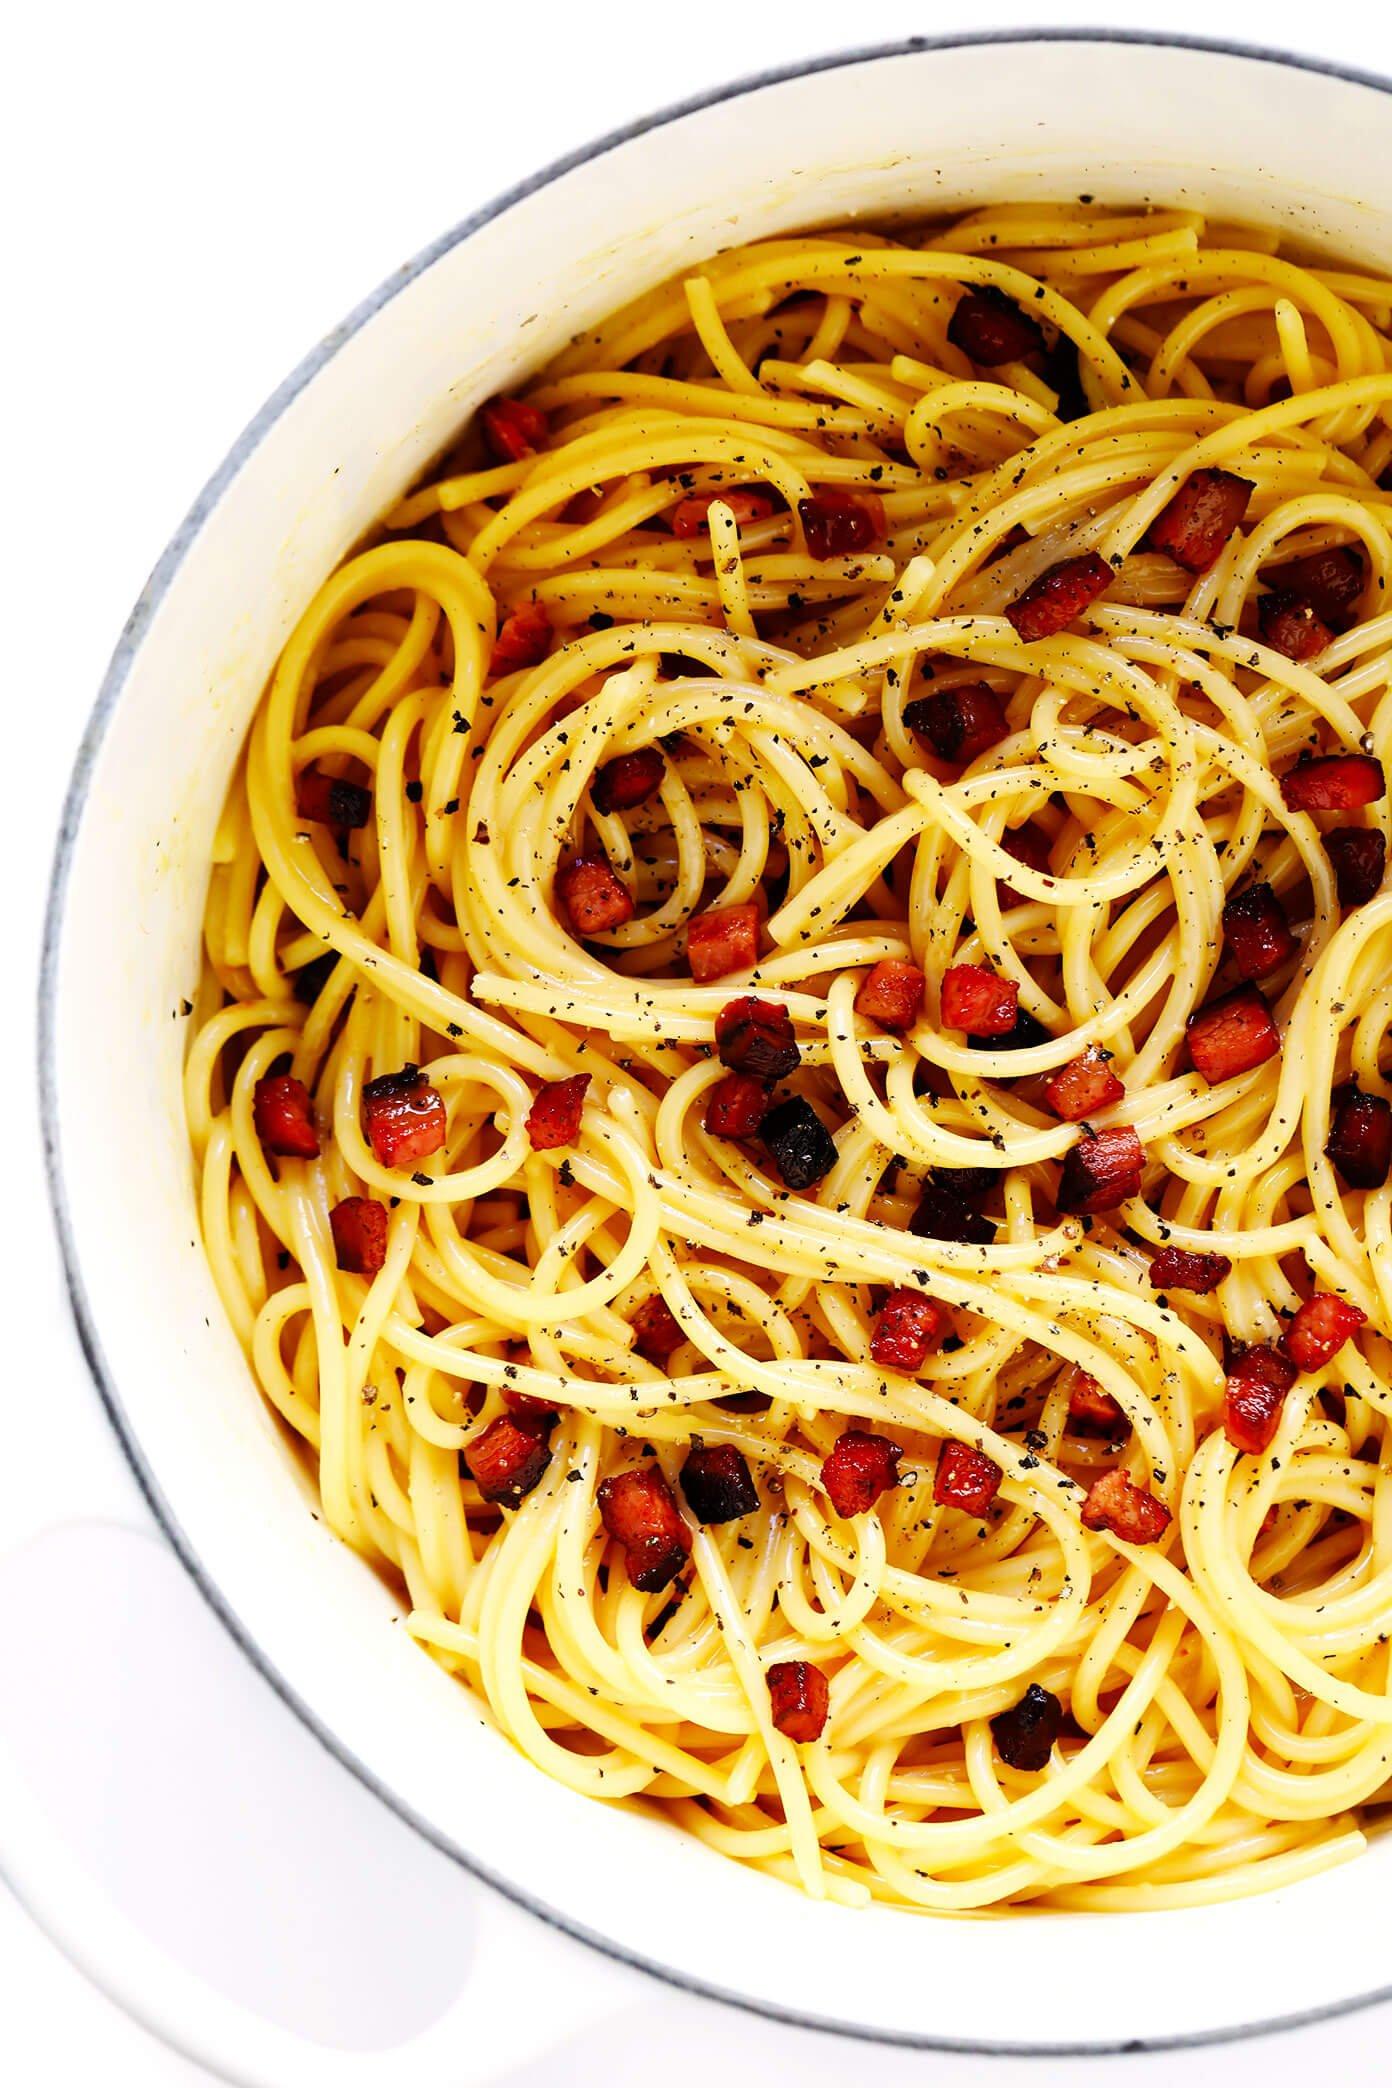 Large pot of spaghetti carbonara